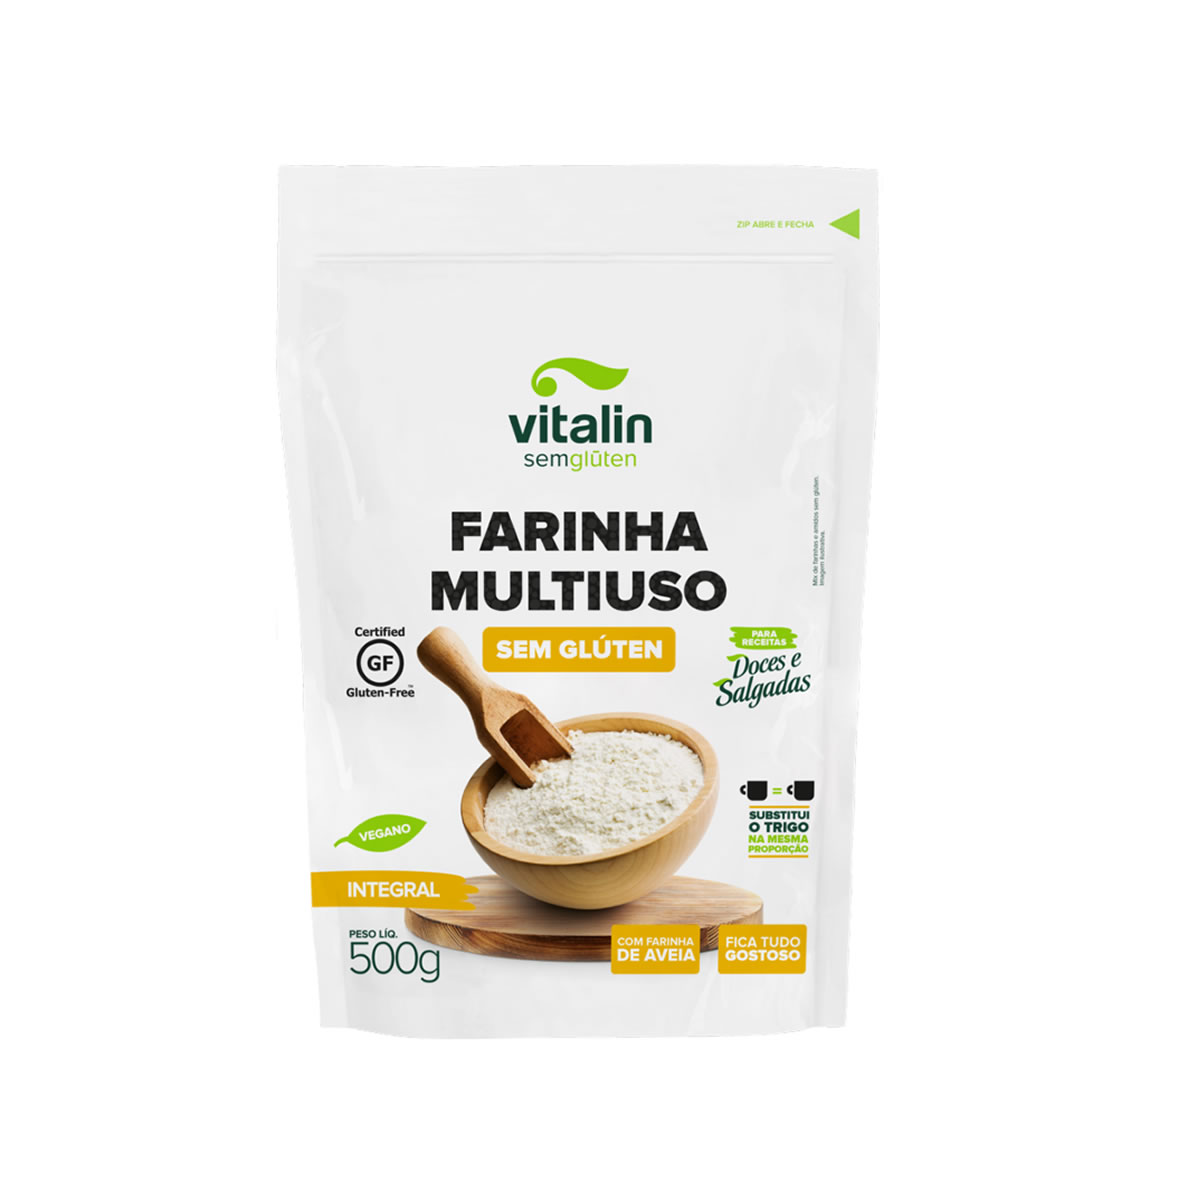 Farinha Multiuso Integral 500g - Vitalin